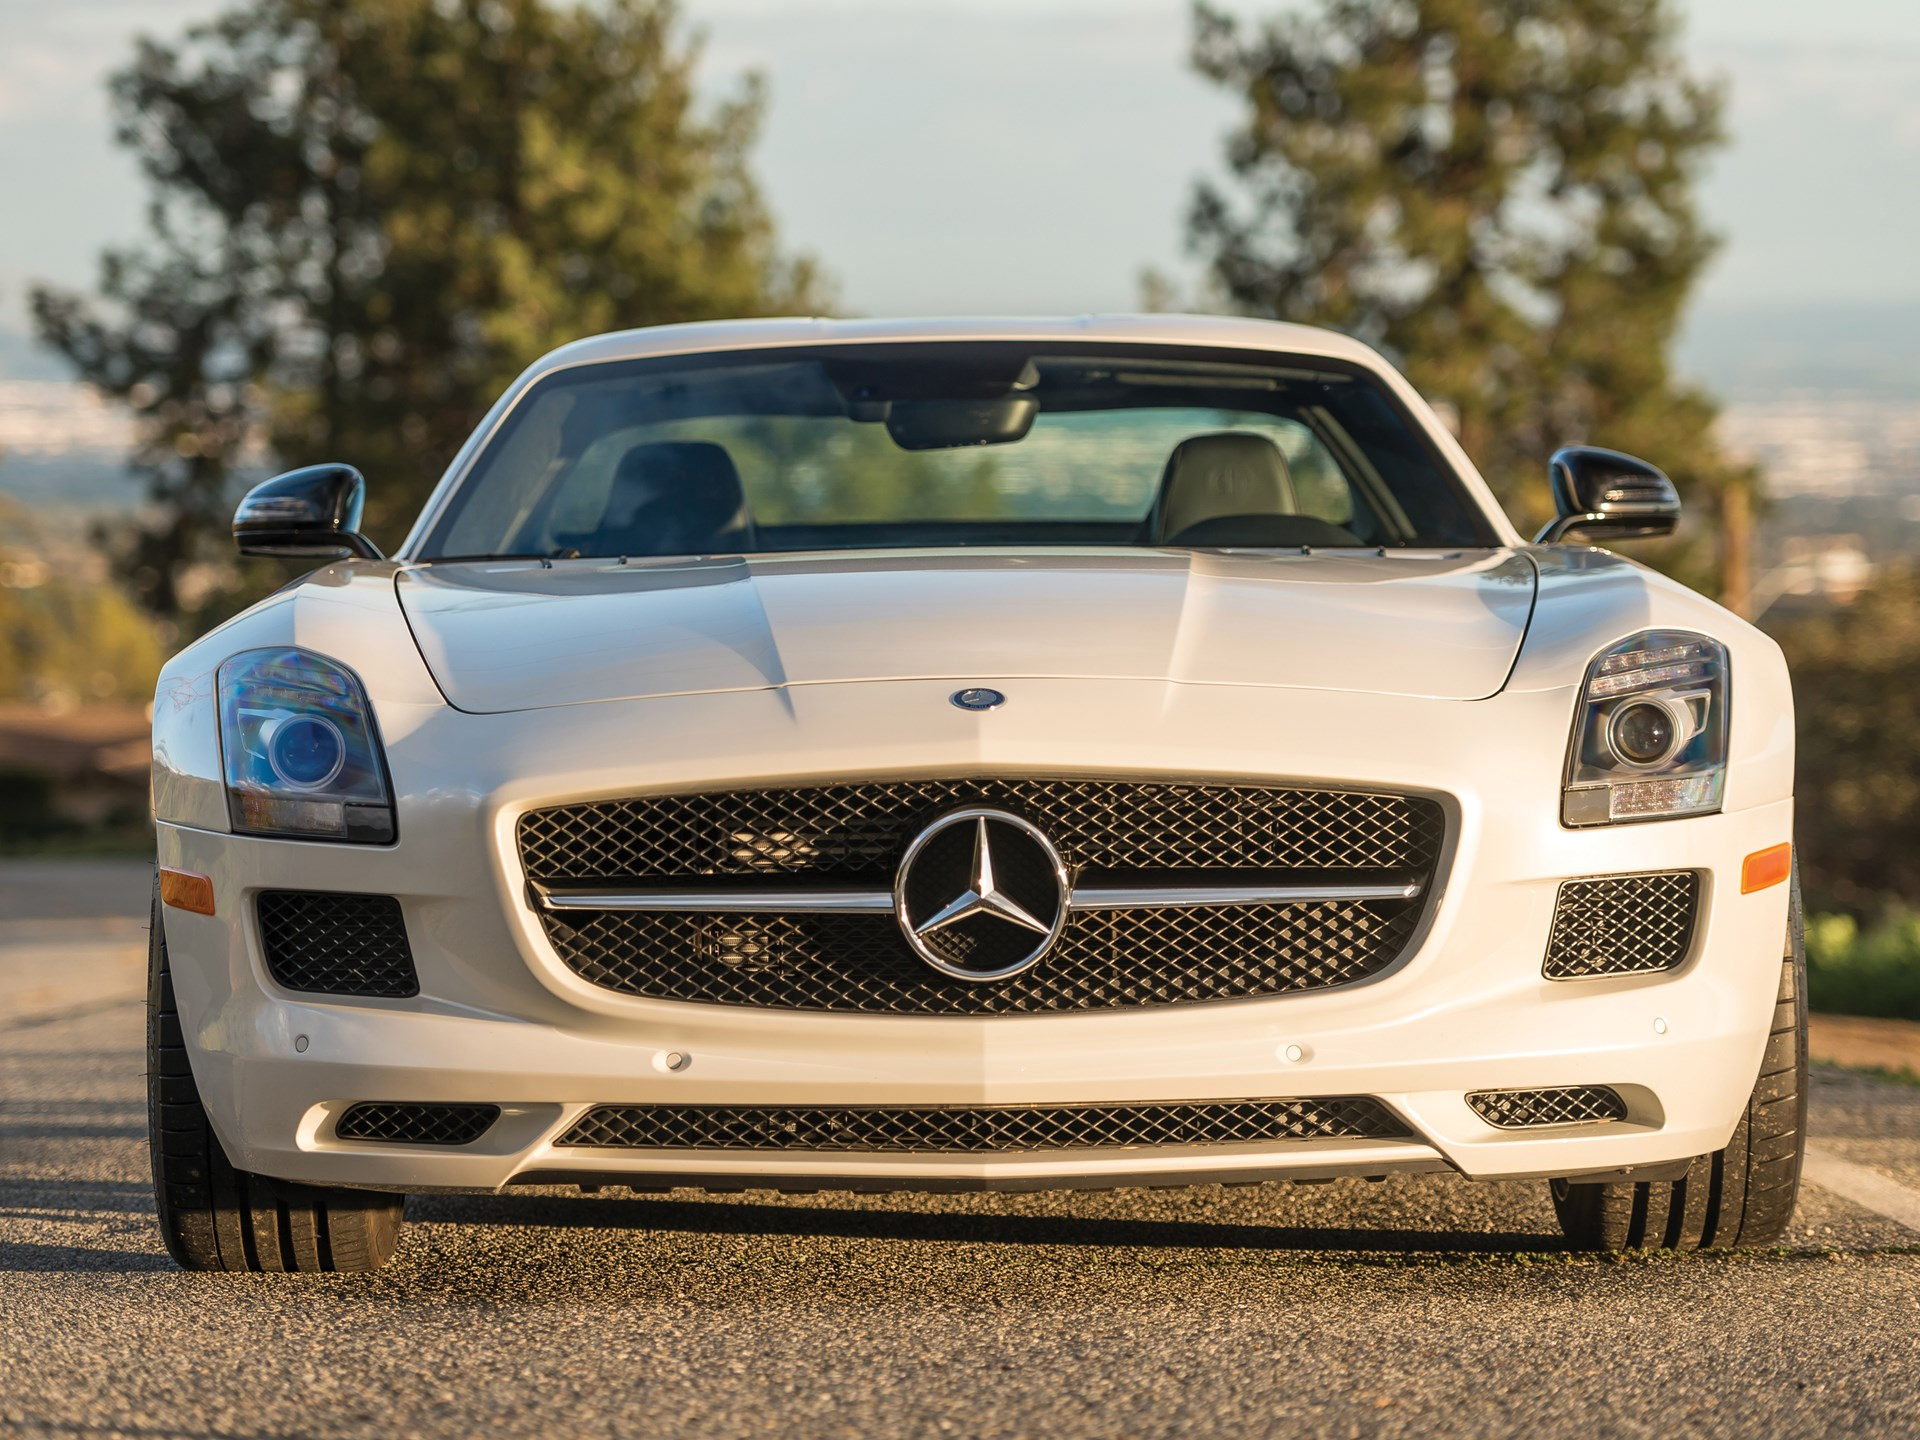 Rm Sotheby S 2013 Mercedes Benz Sls Amg Gt Fort Lauderdale 2019